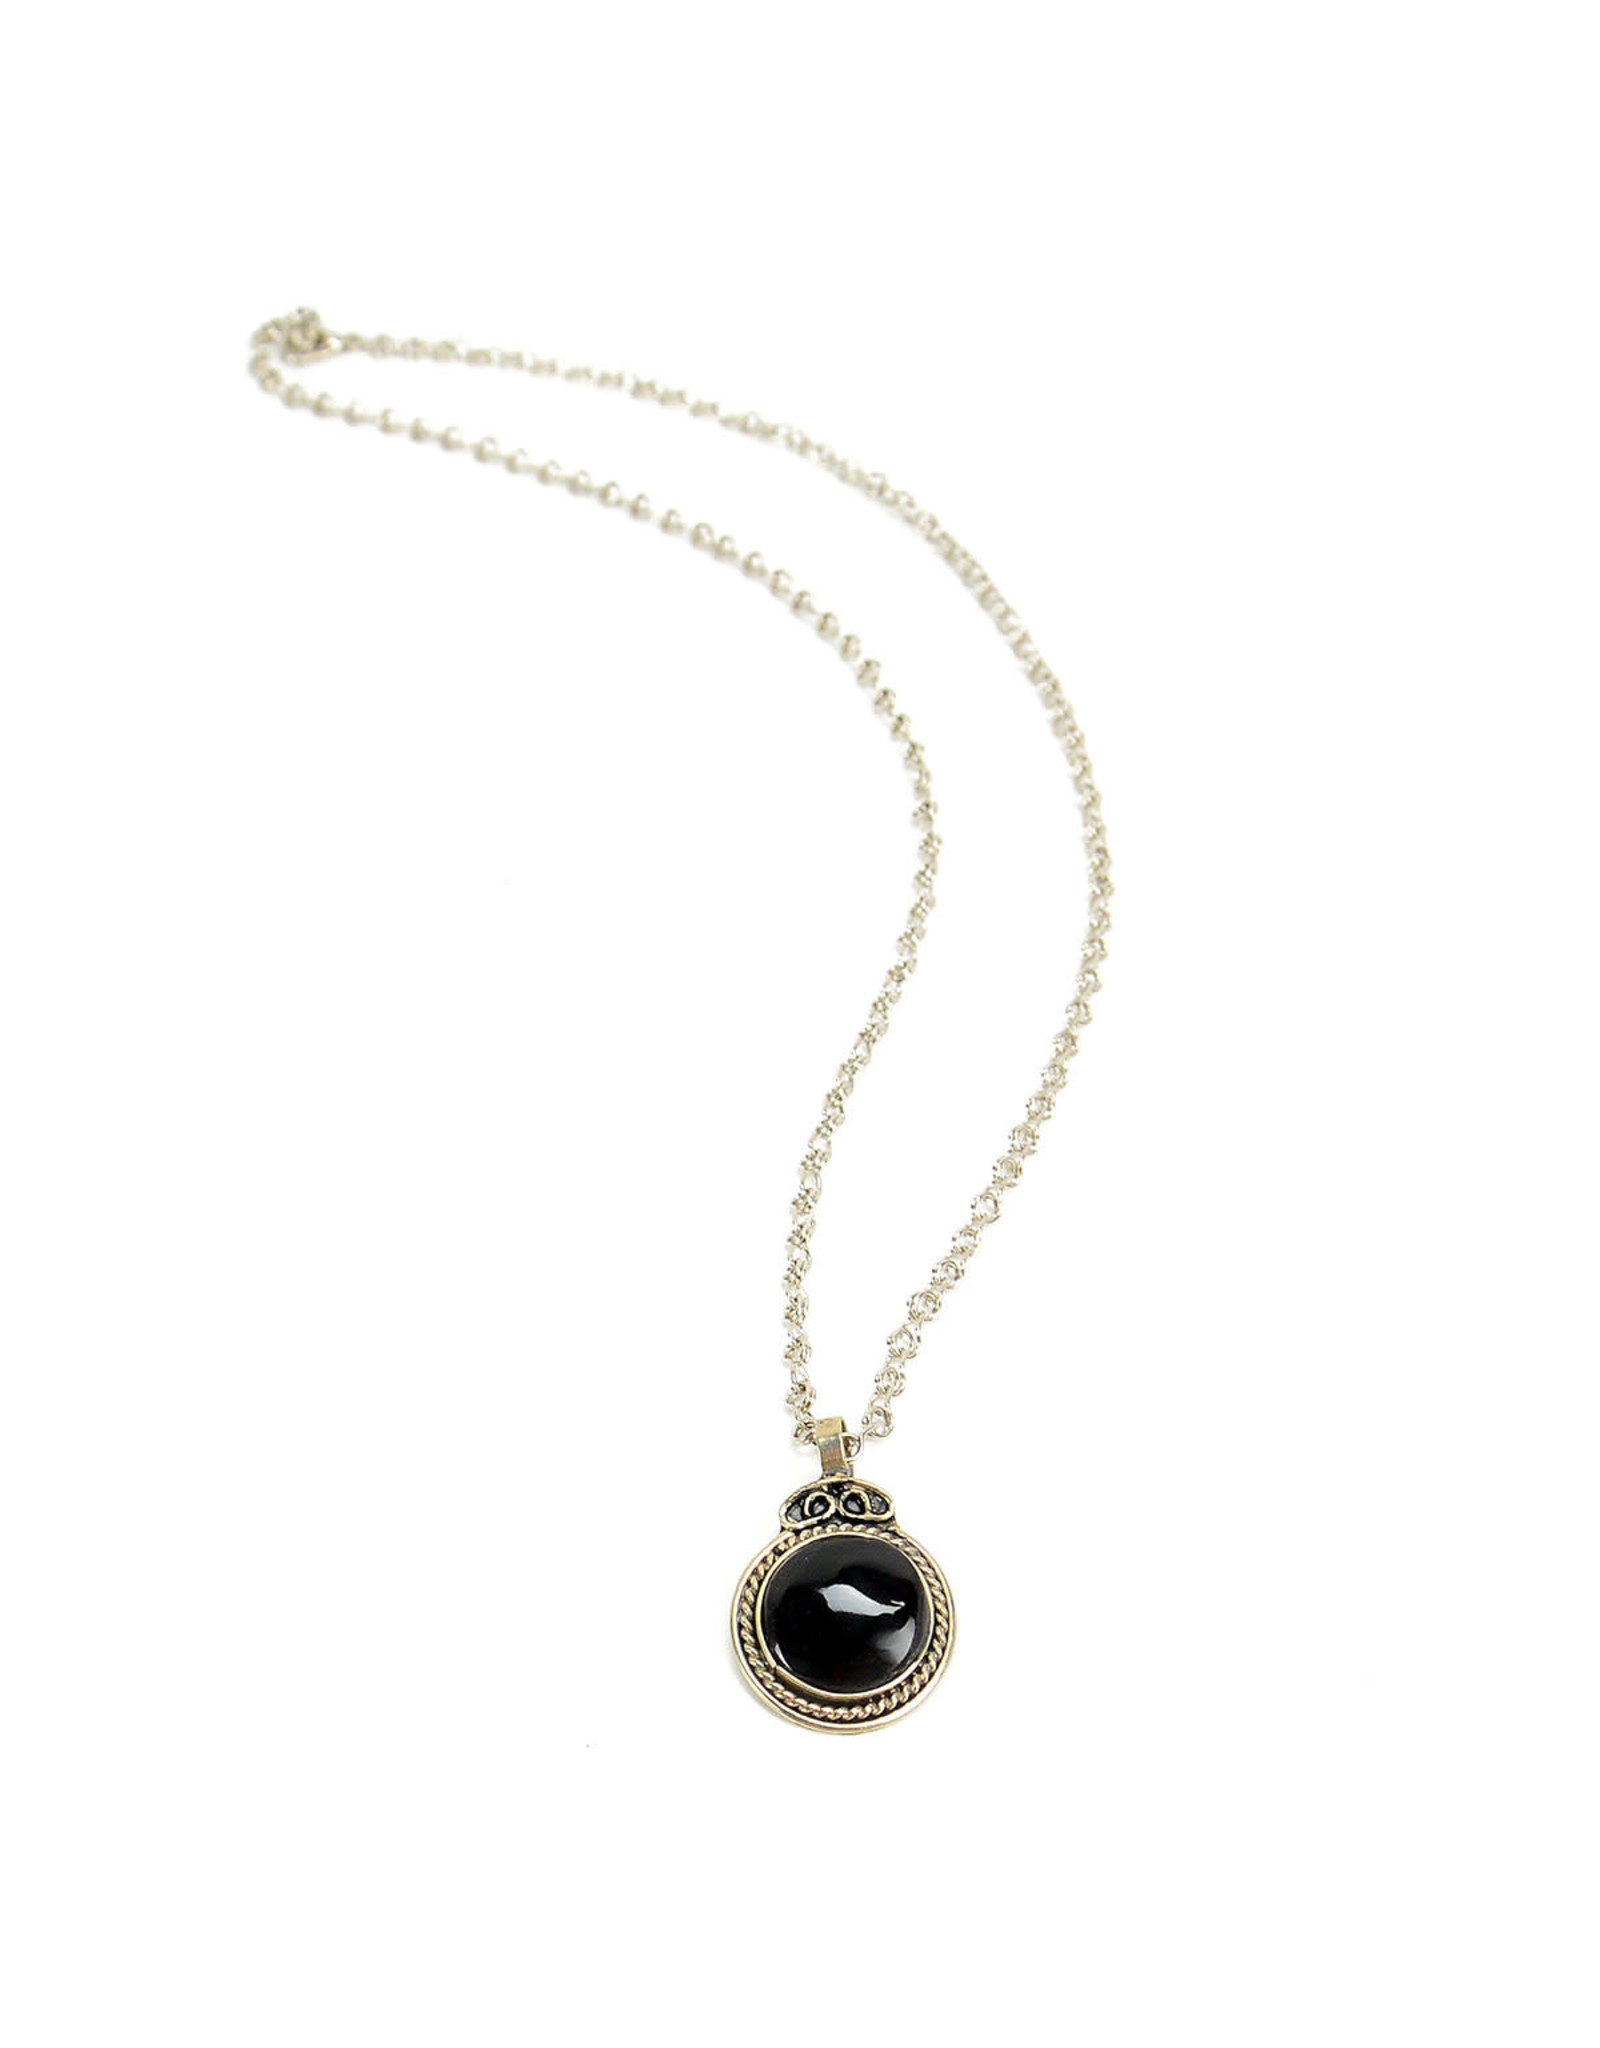 Black Onyx Alpaca Necklace, Peru